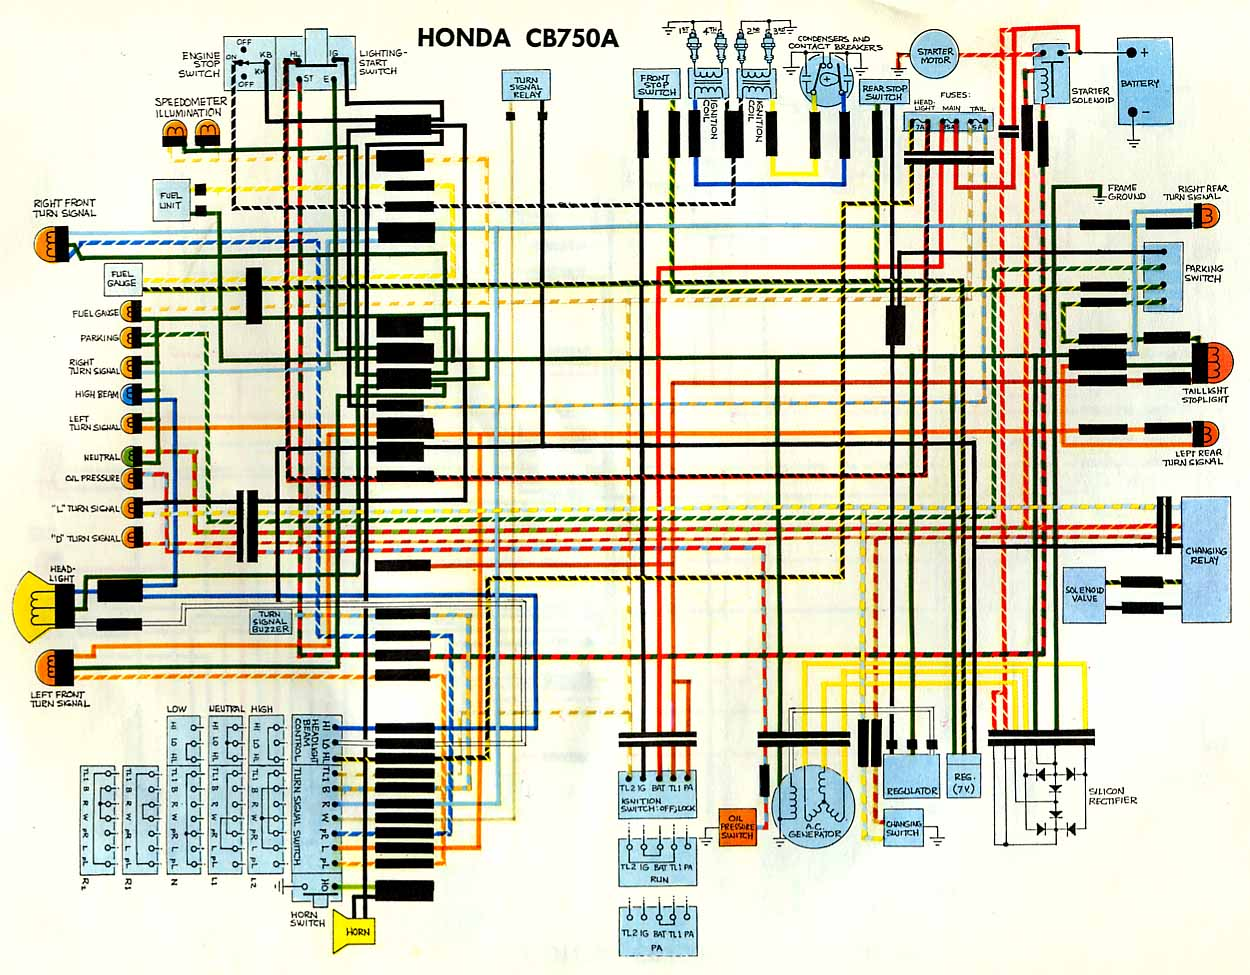 Honda Cb 750 1995 Wiring Diagram - 1980 Ford F250 Wiring Diagram for Wiring  Diagram SchematicsWiring Diagram Schematics